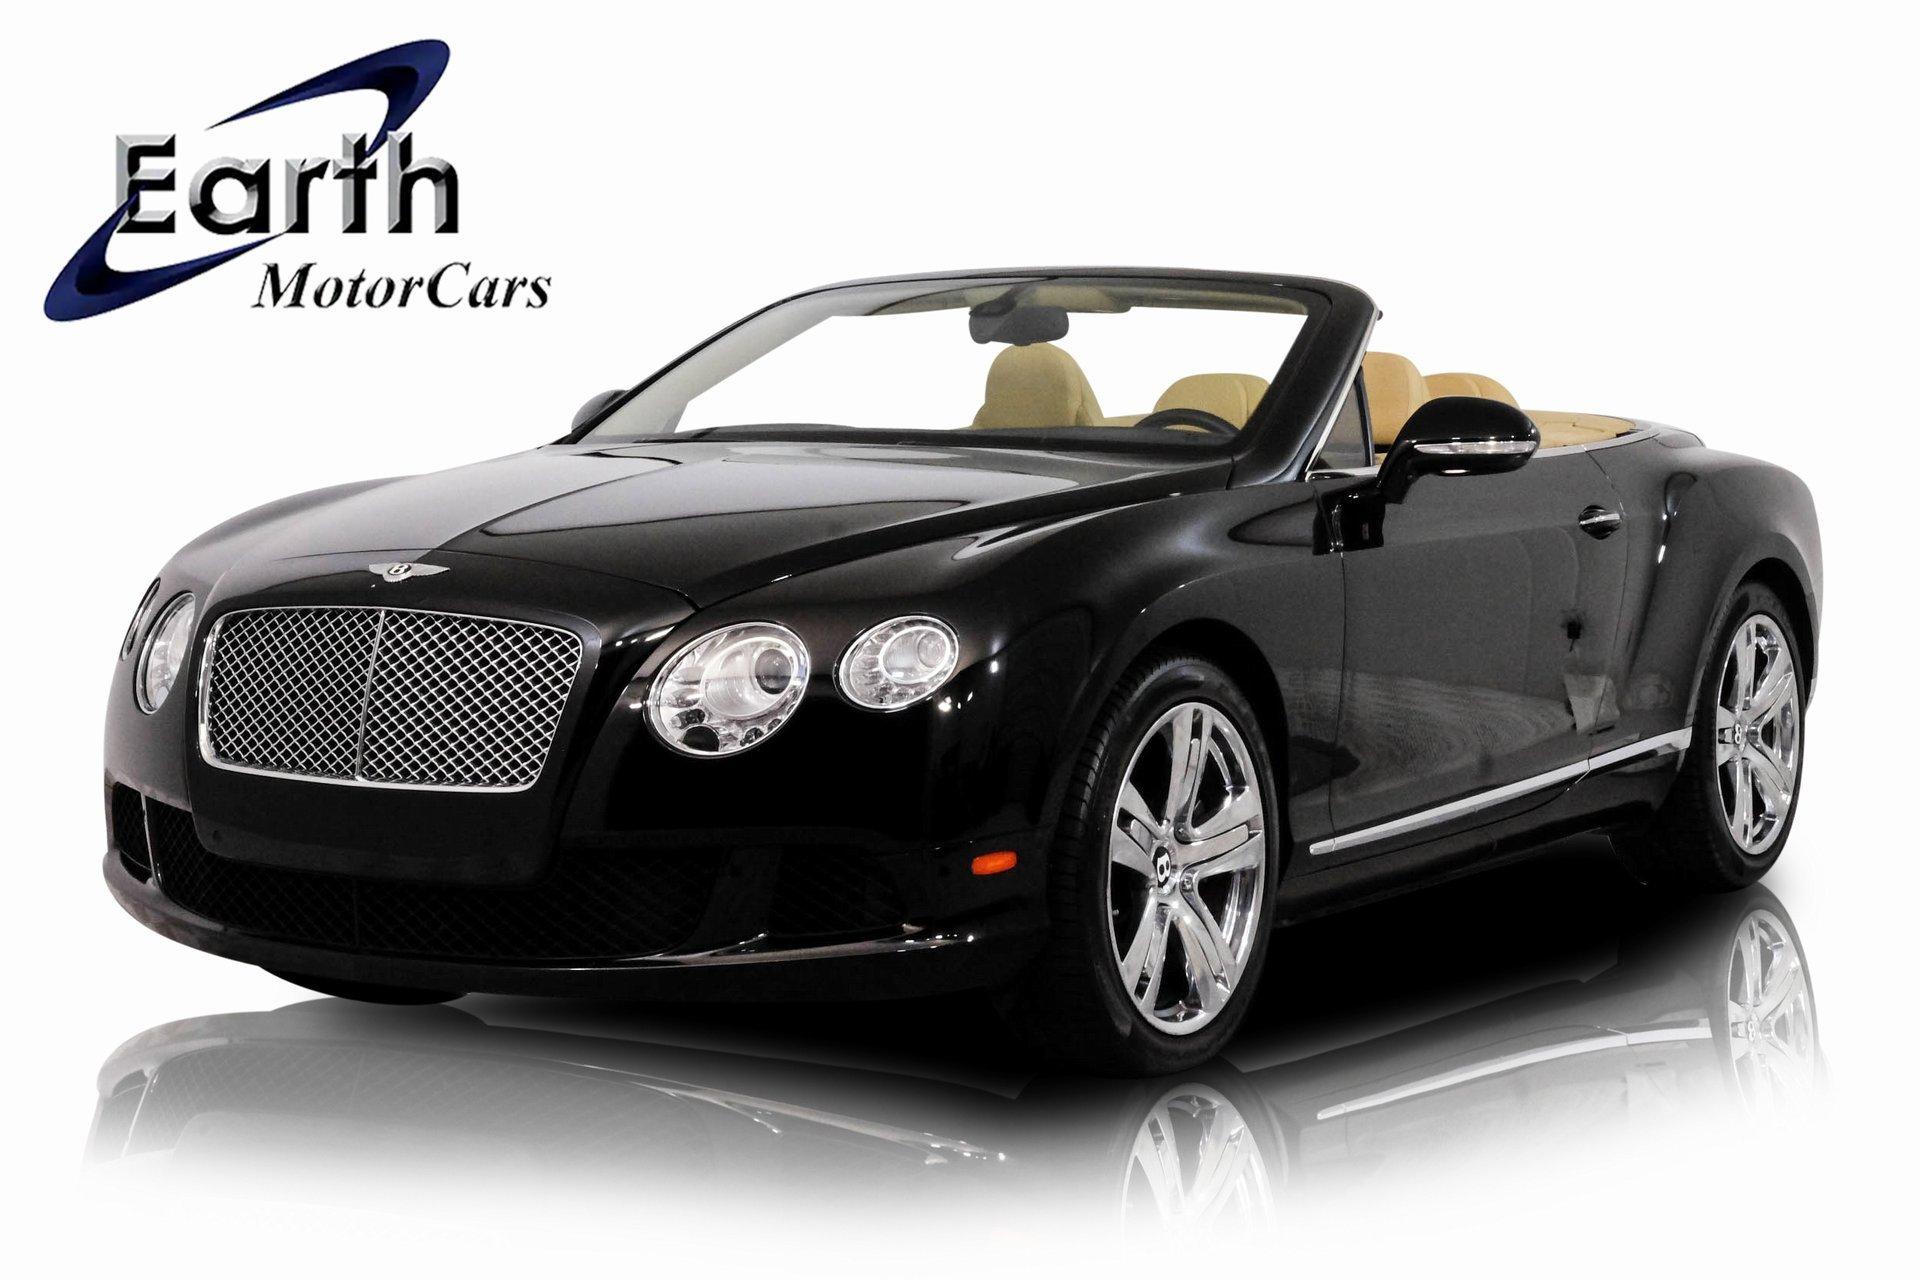 2013 Bentley Continental GT Convertible image